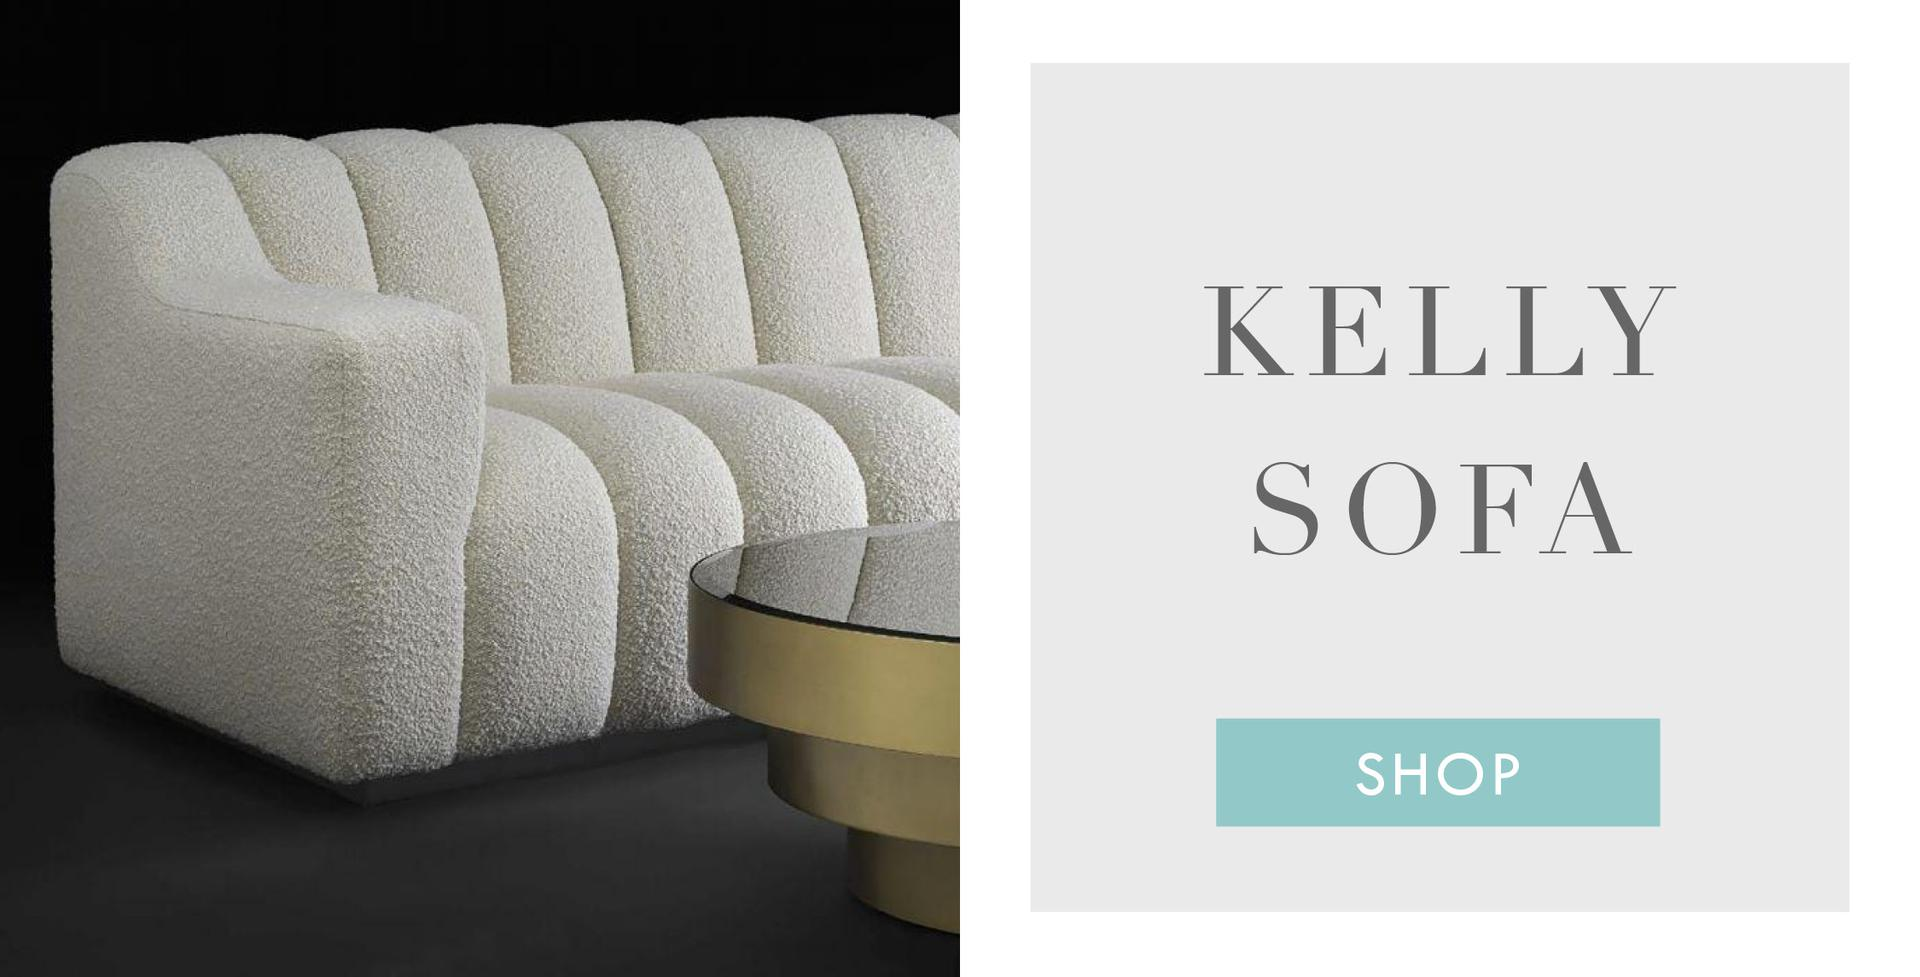 Shop The Kelly Sofa